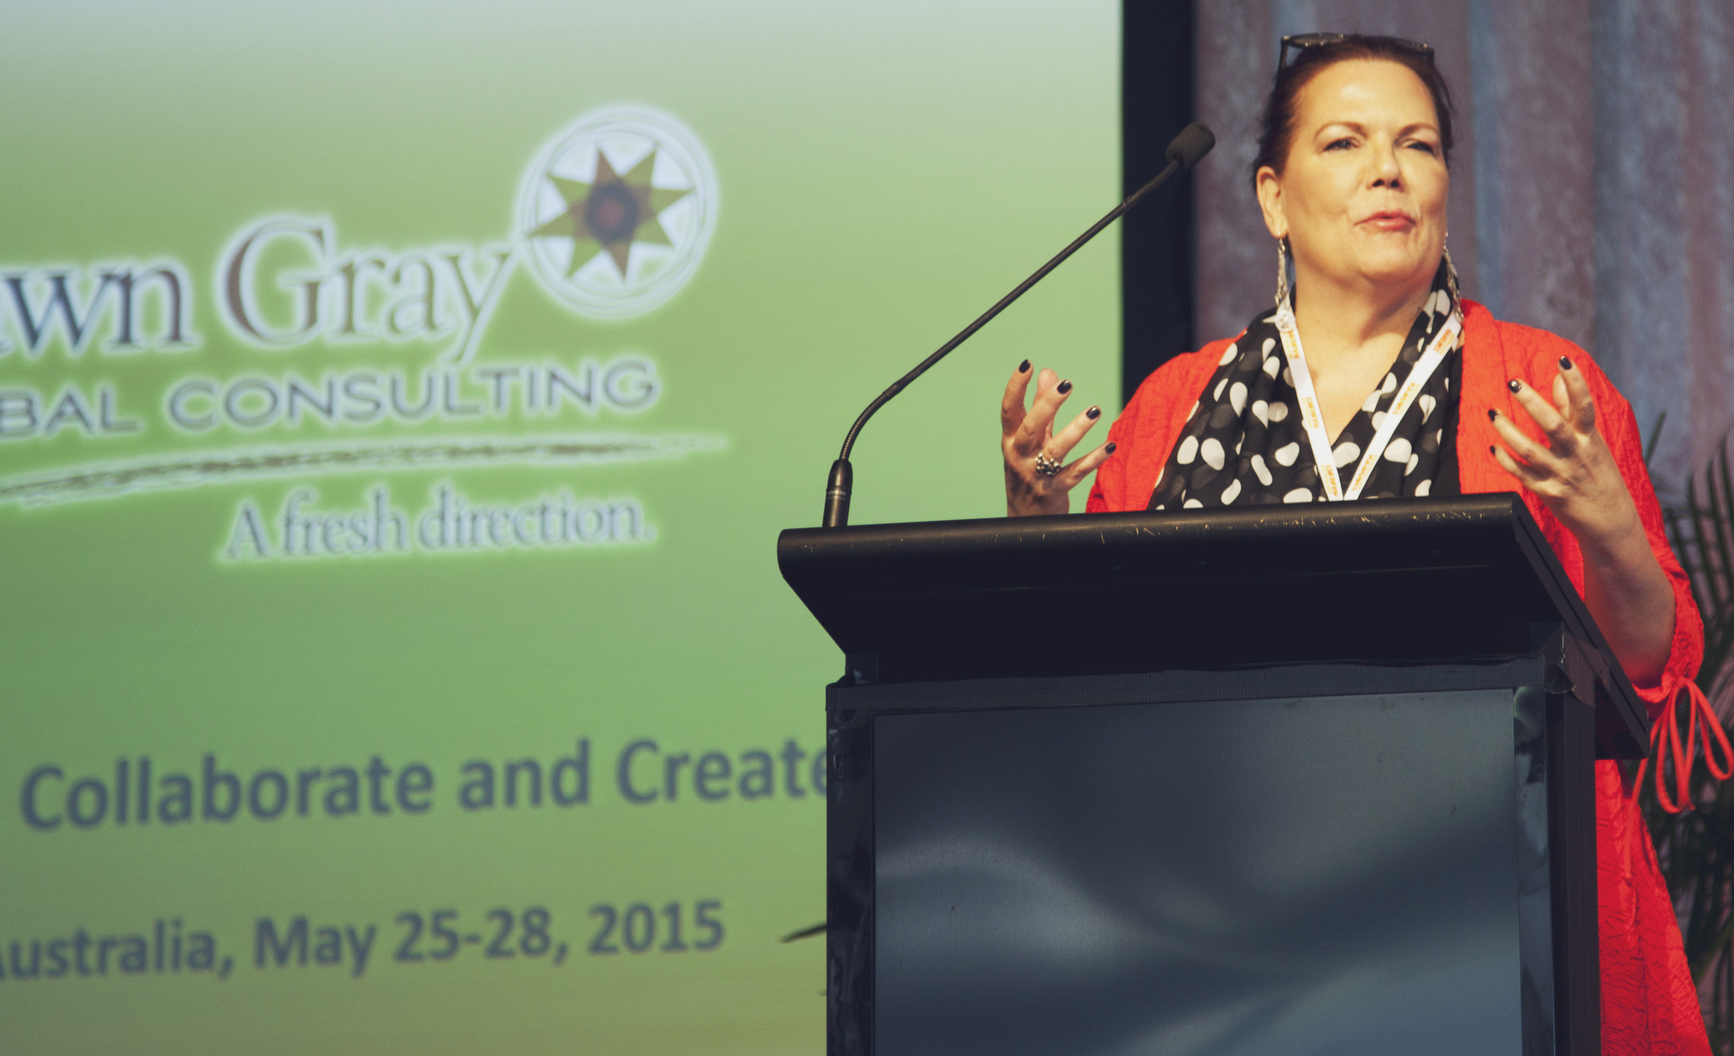 Keynote Speaker Dawn Gray